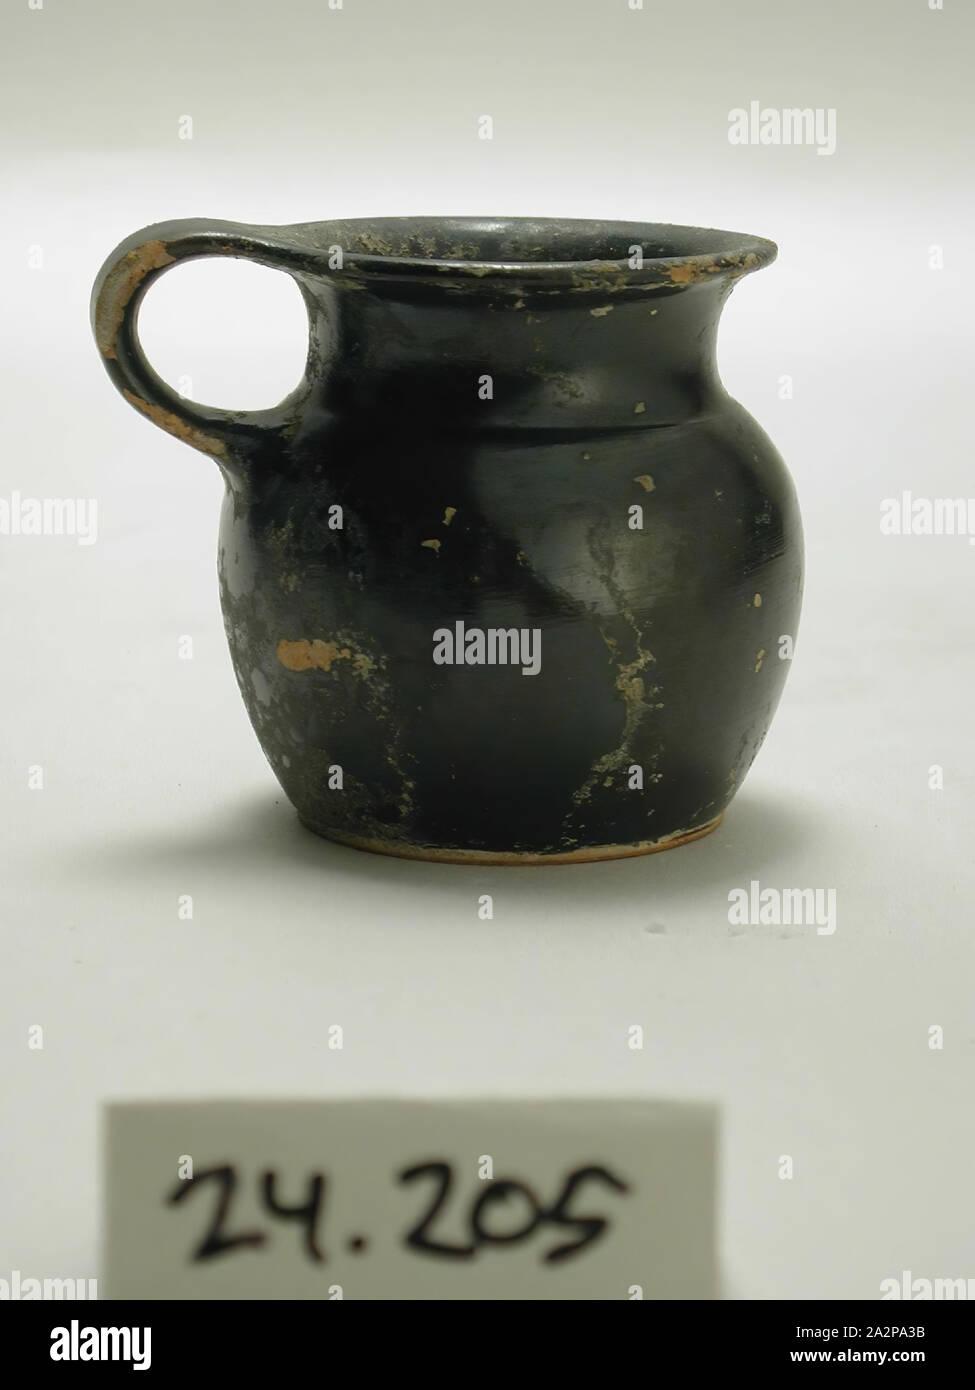 460 3 Stock Photos & 460 3 Stock Images - Alamy Zibo Gl Vase on